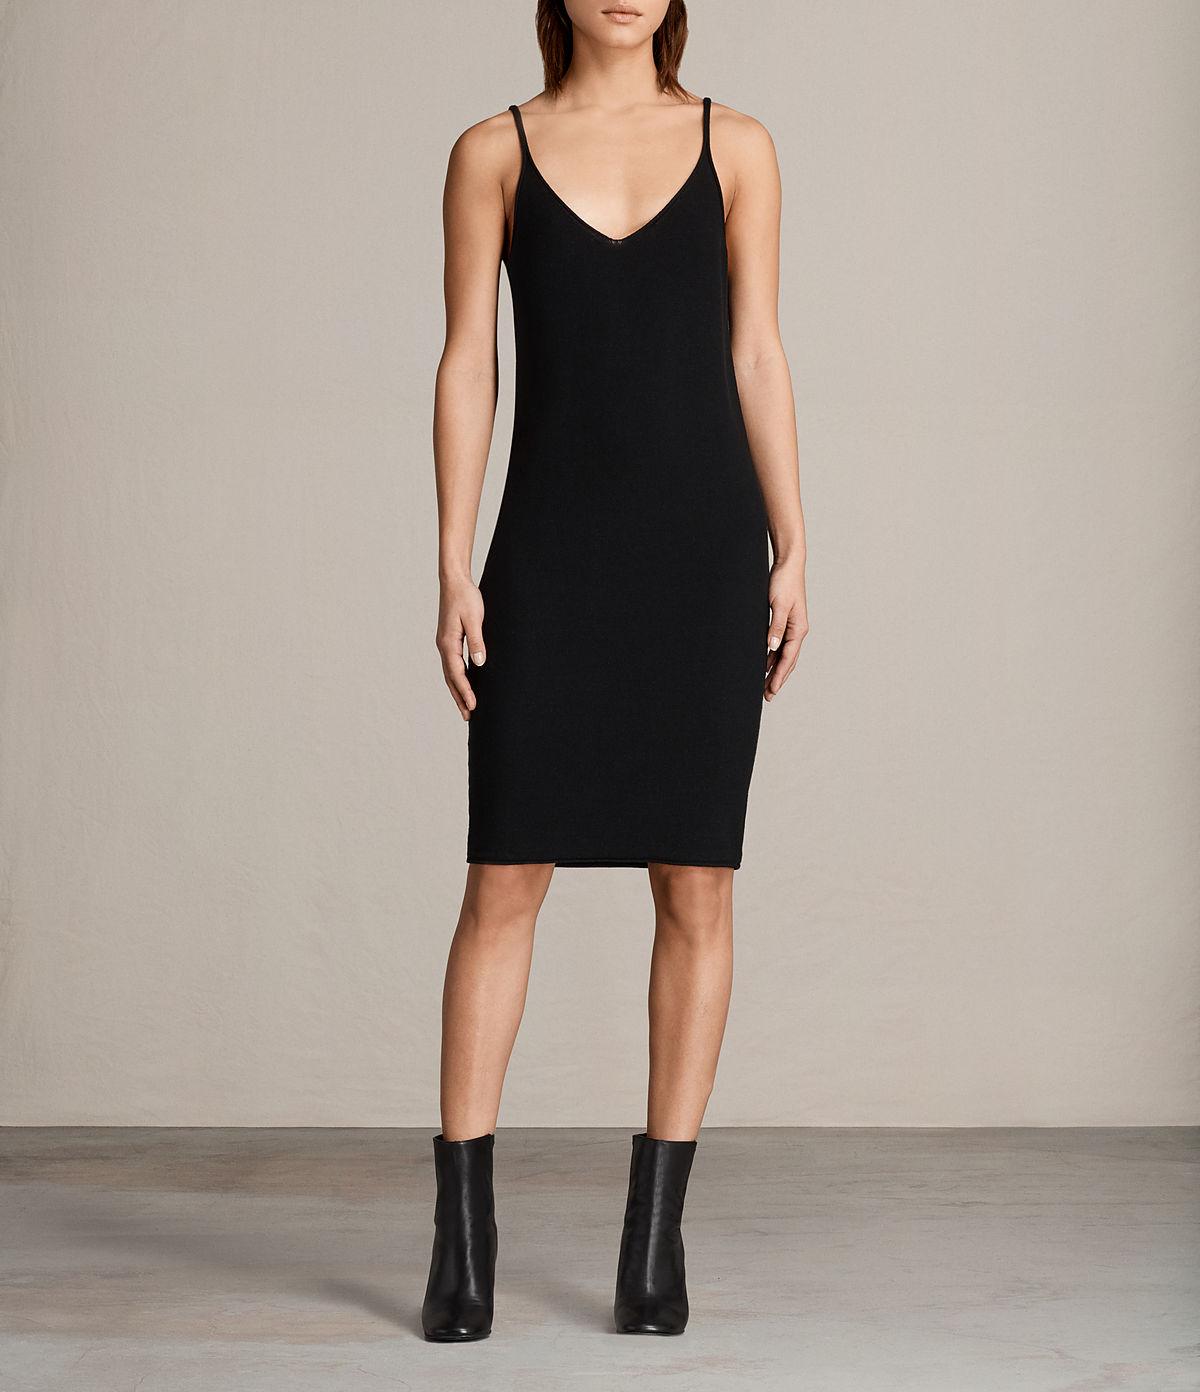 blyth-vest-dress